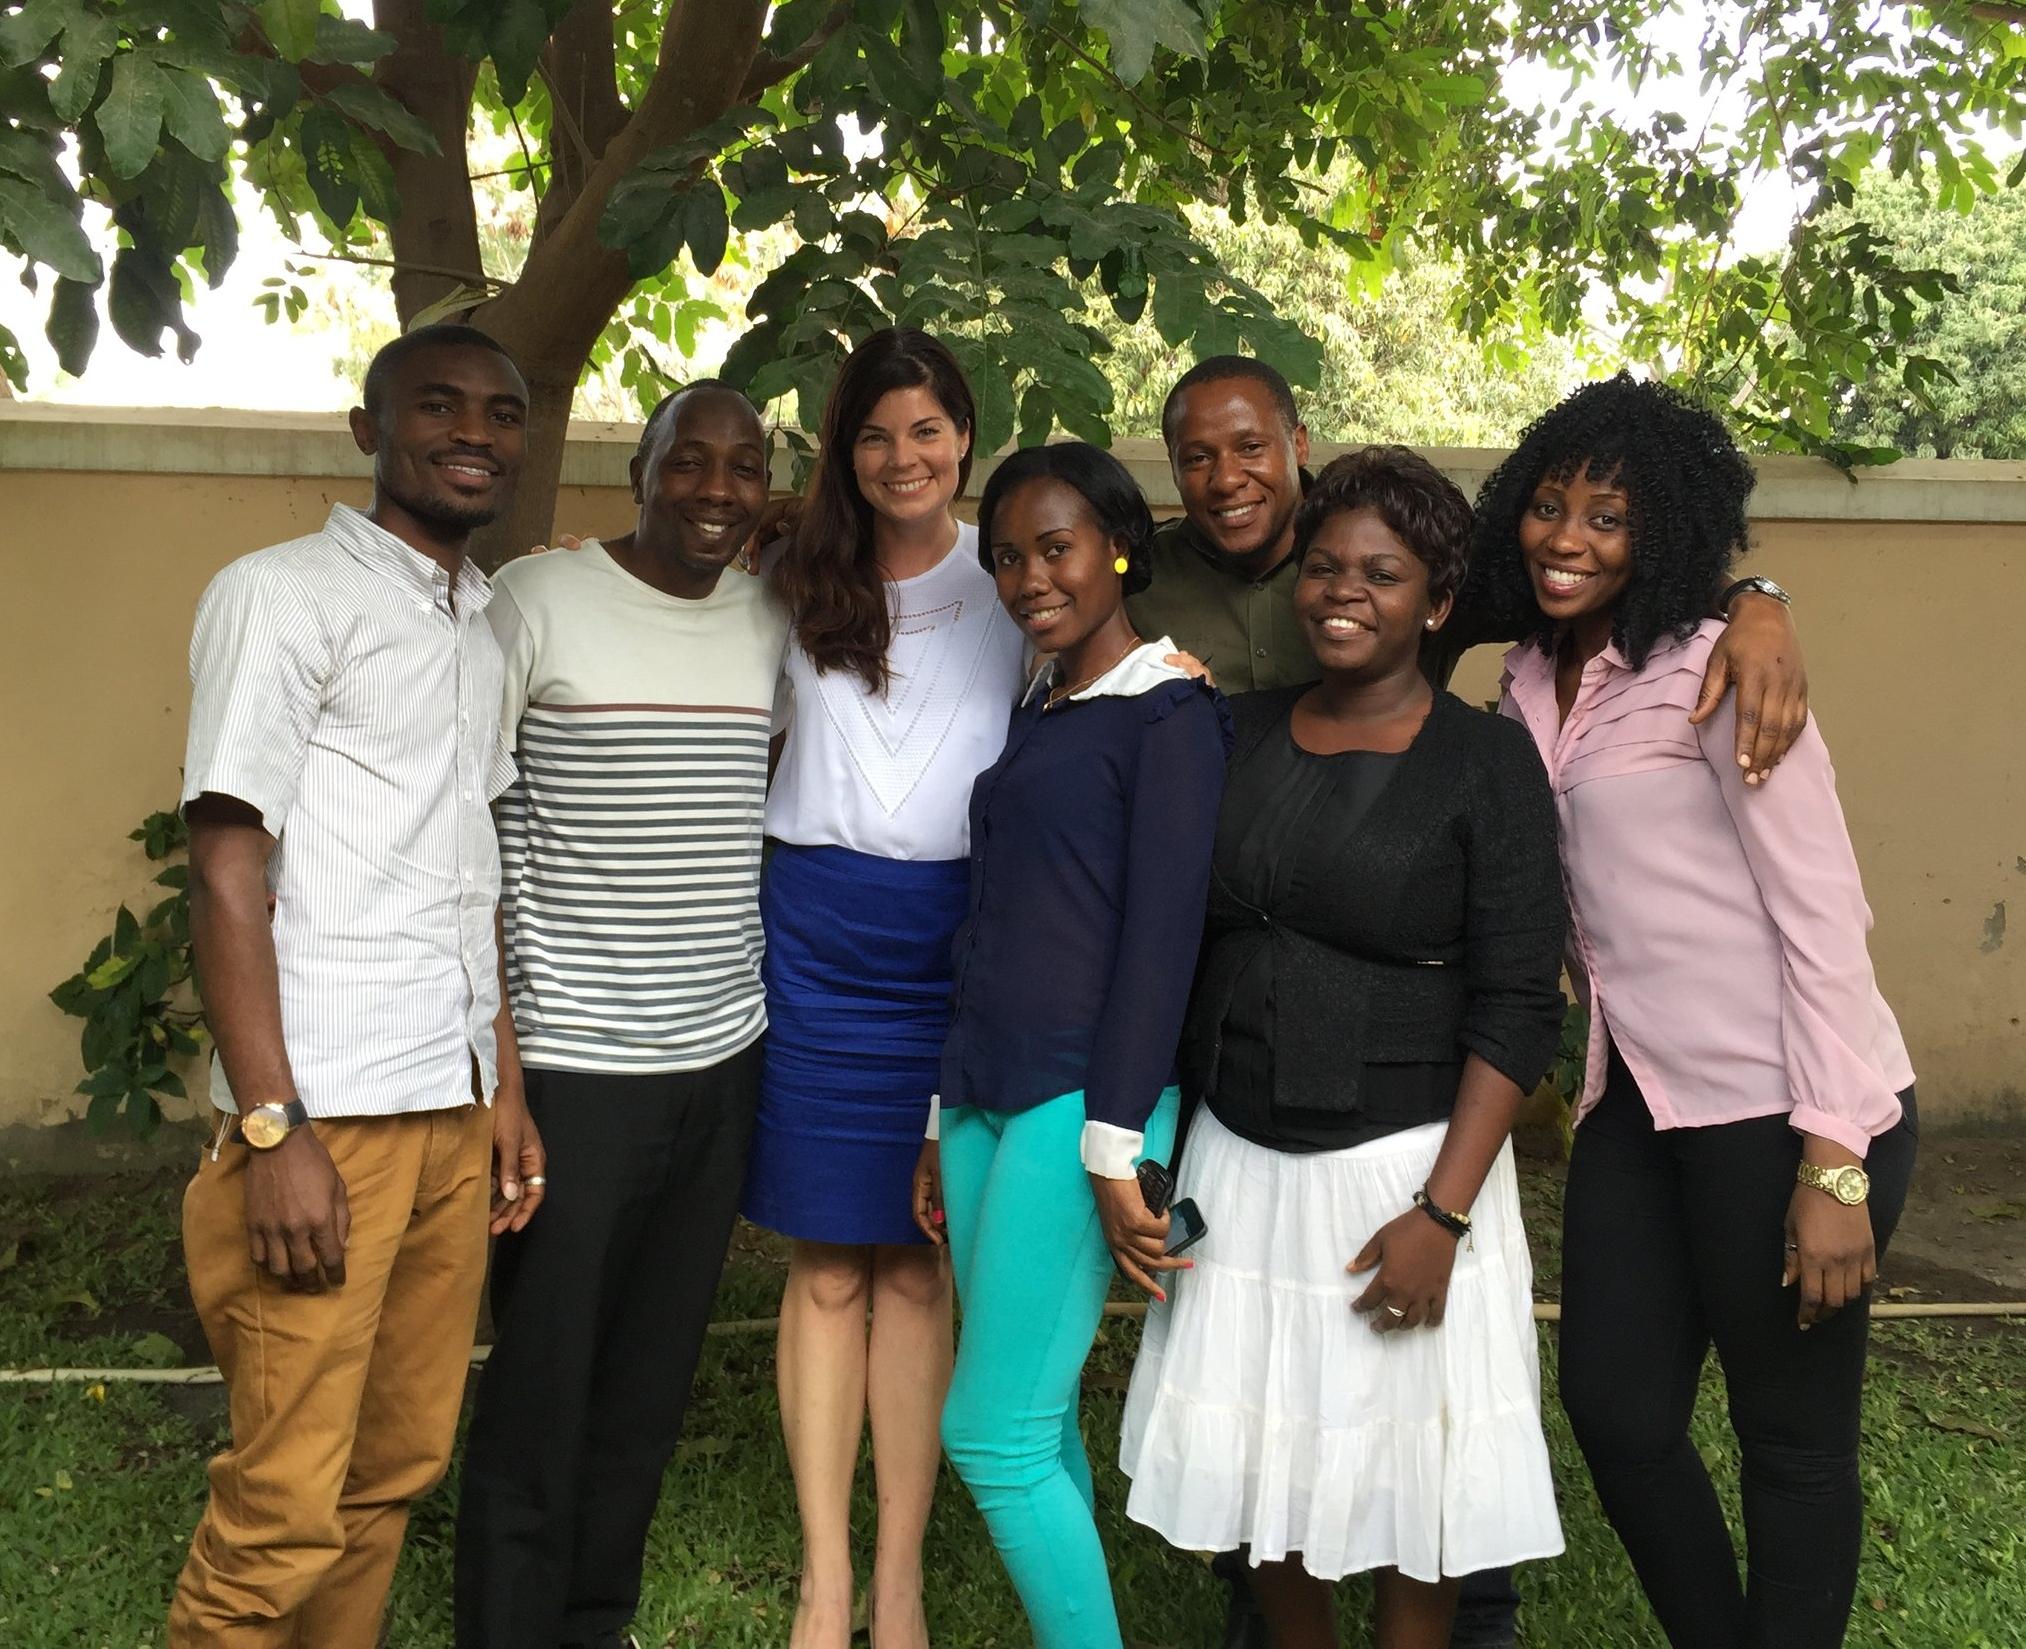 Members of our research team in Shinyanga, Tanzania.